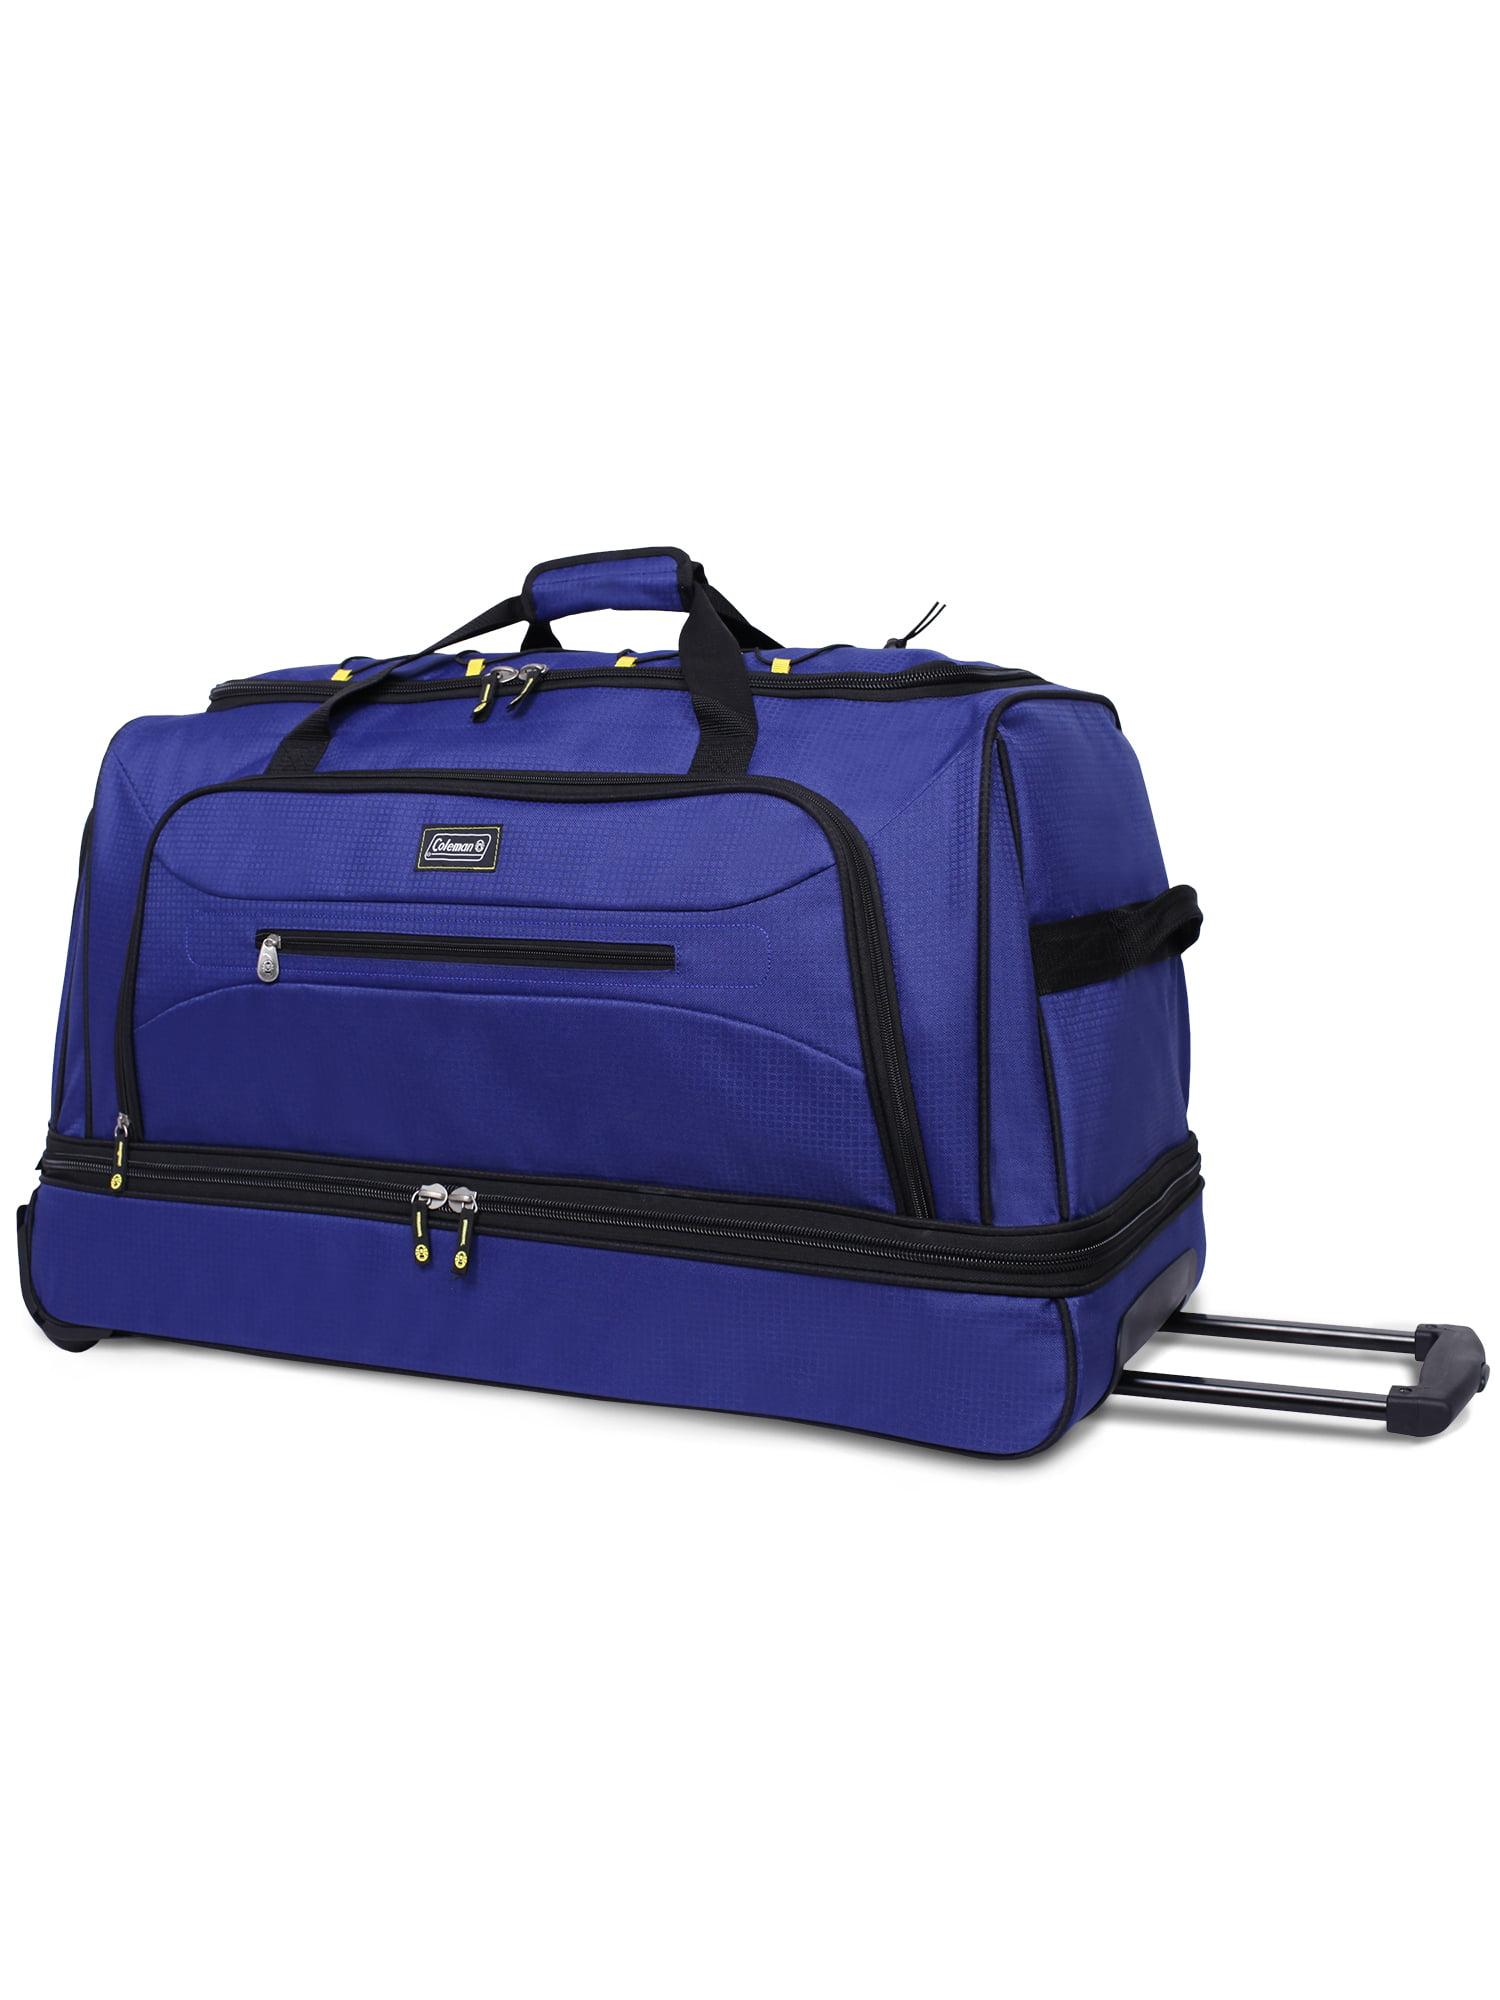 Coleman 30in Rolling Drop Bottom Duffel Bag, Blue